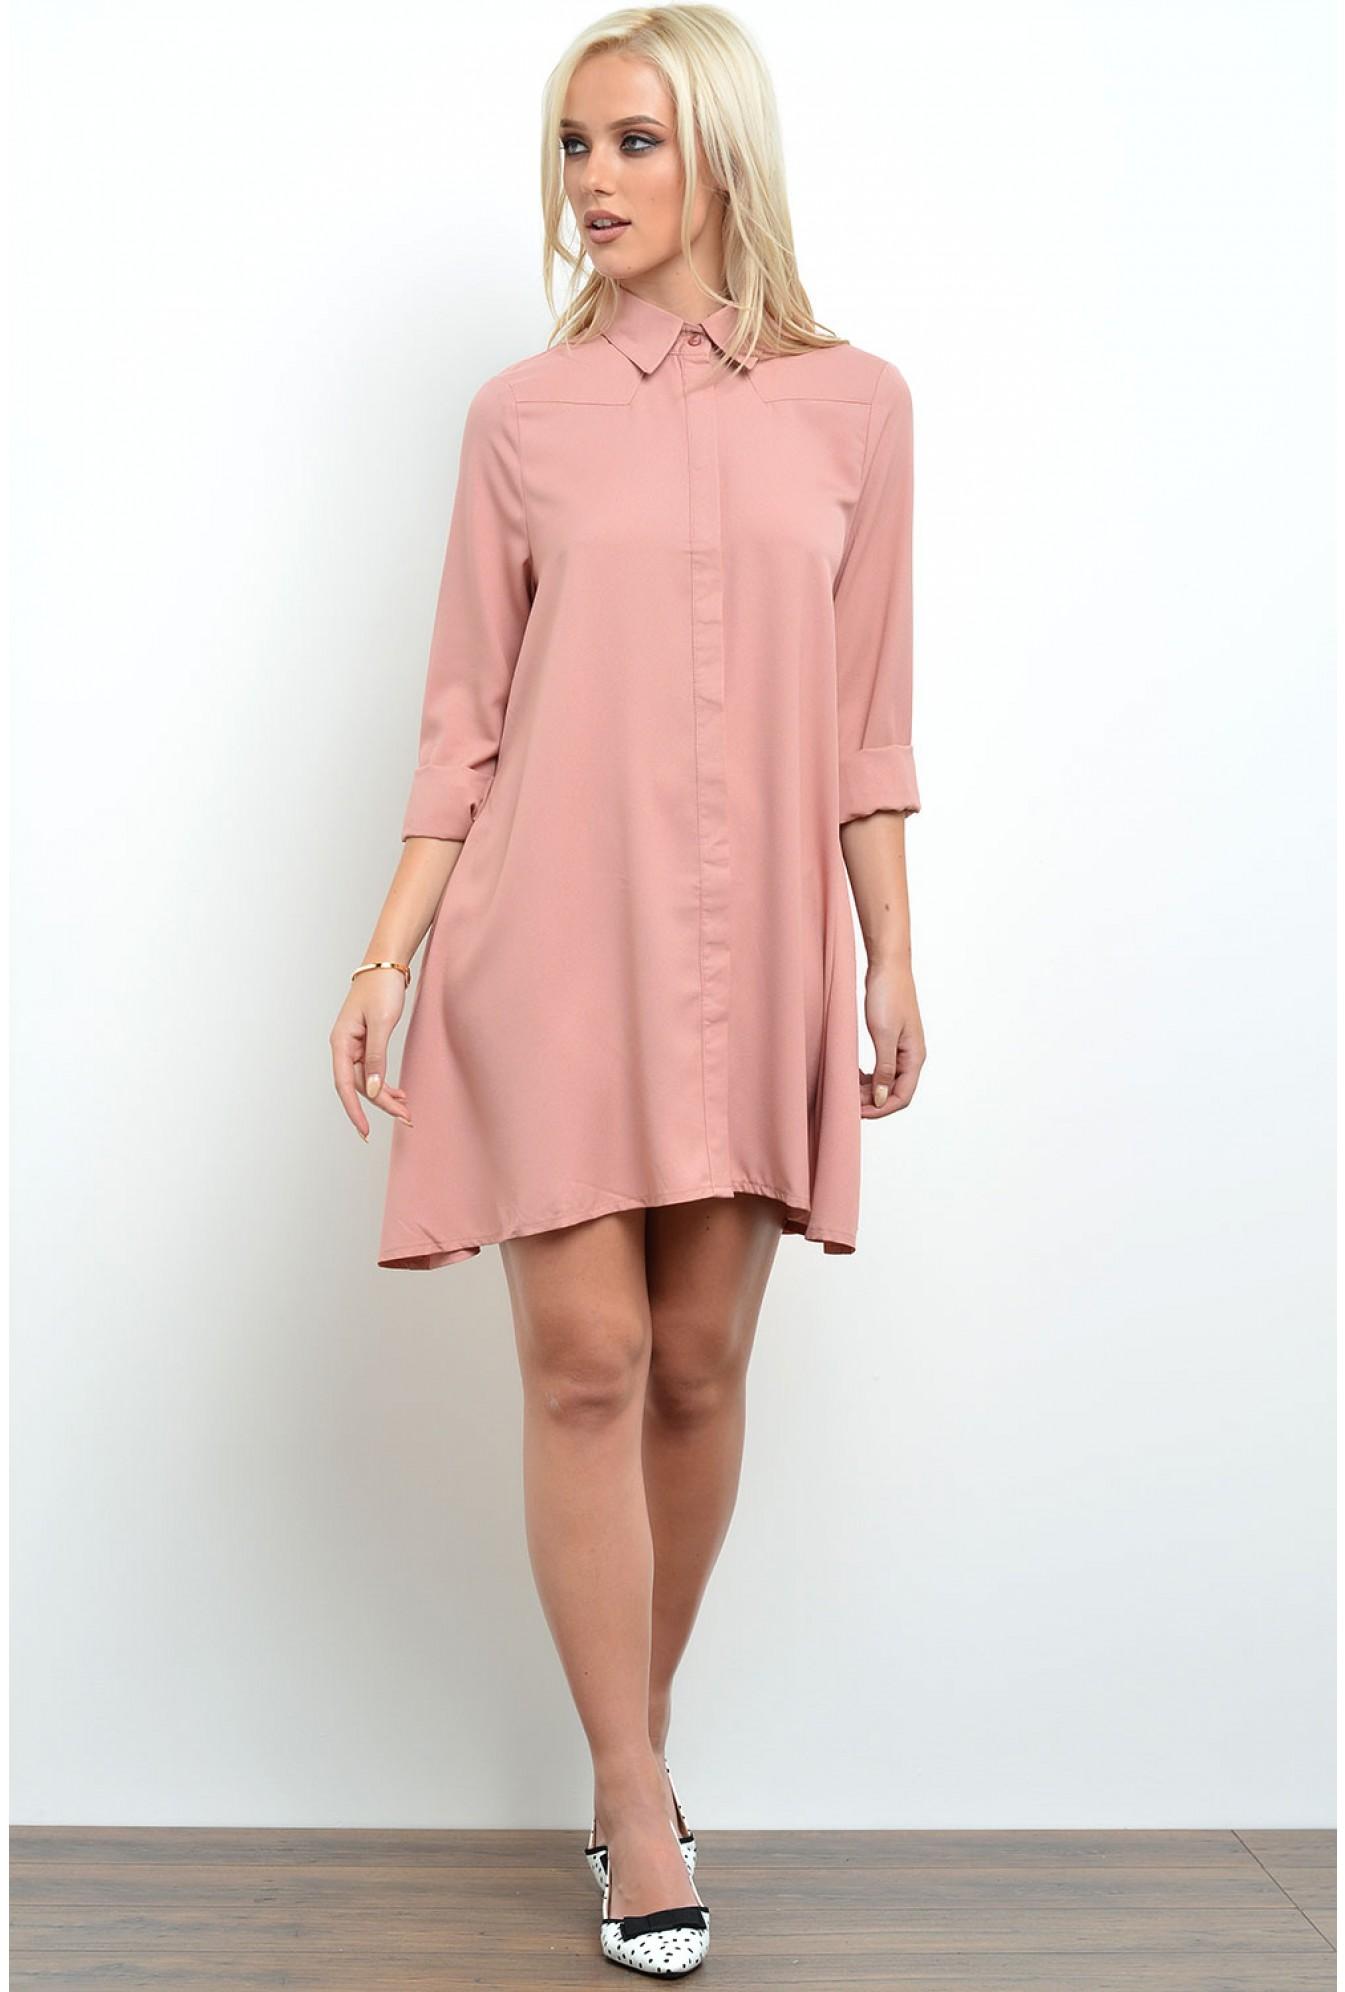 104b3711fd6c Glamorous Lonnie Swing Shirt Dress in Dusty Pink